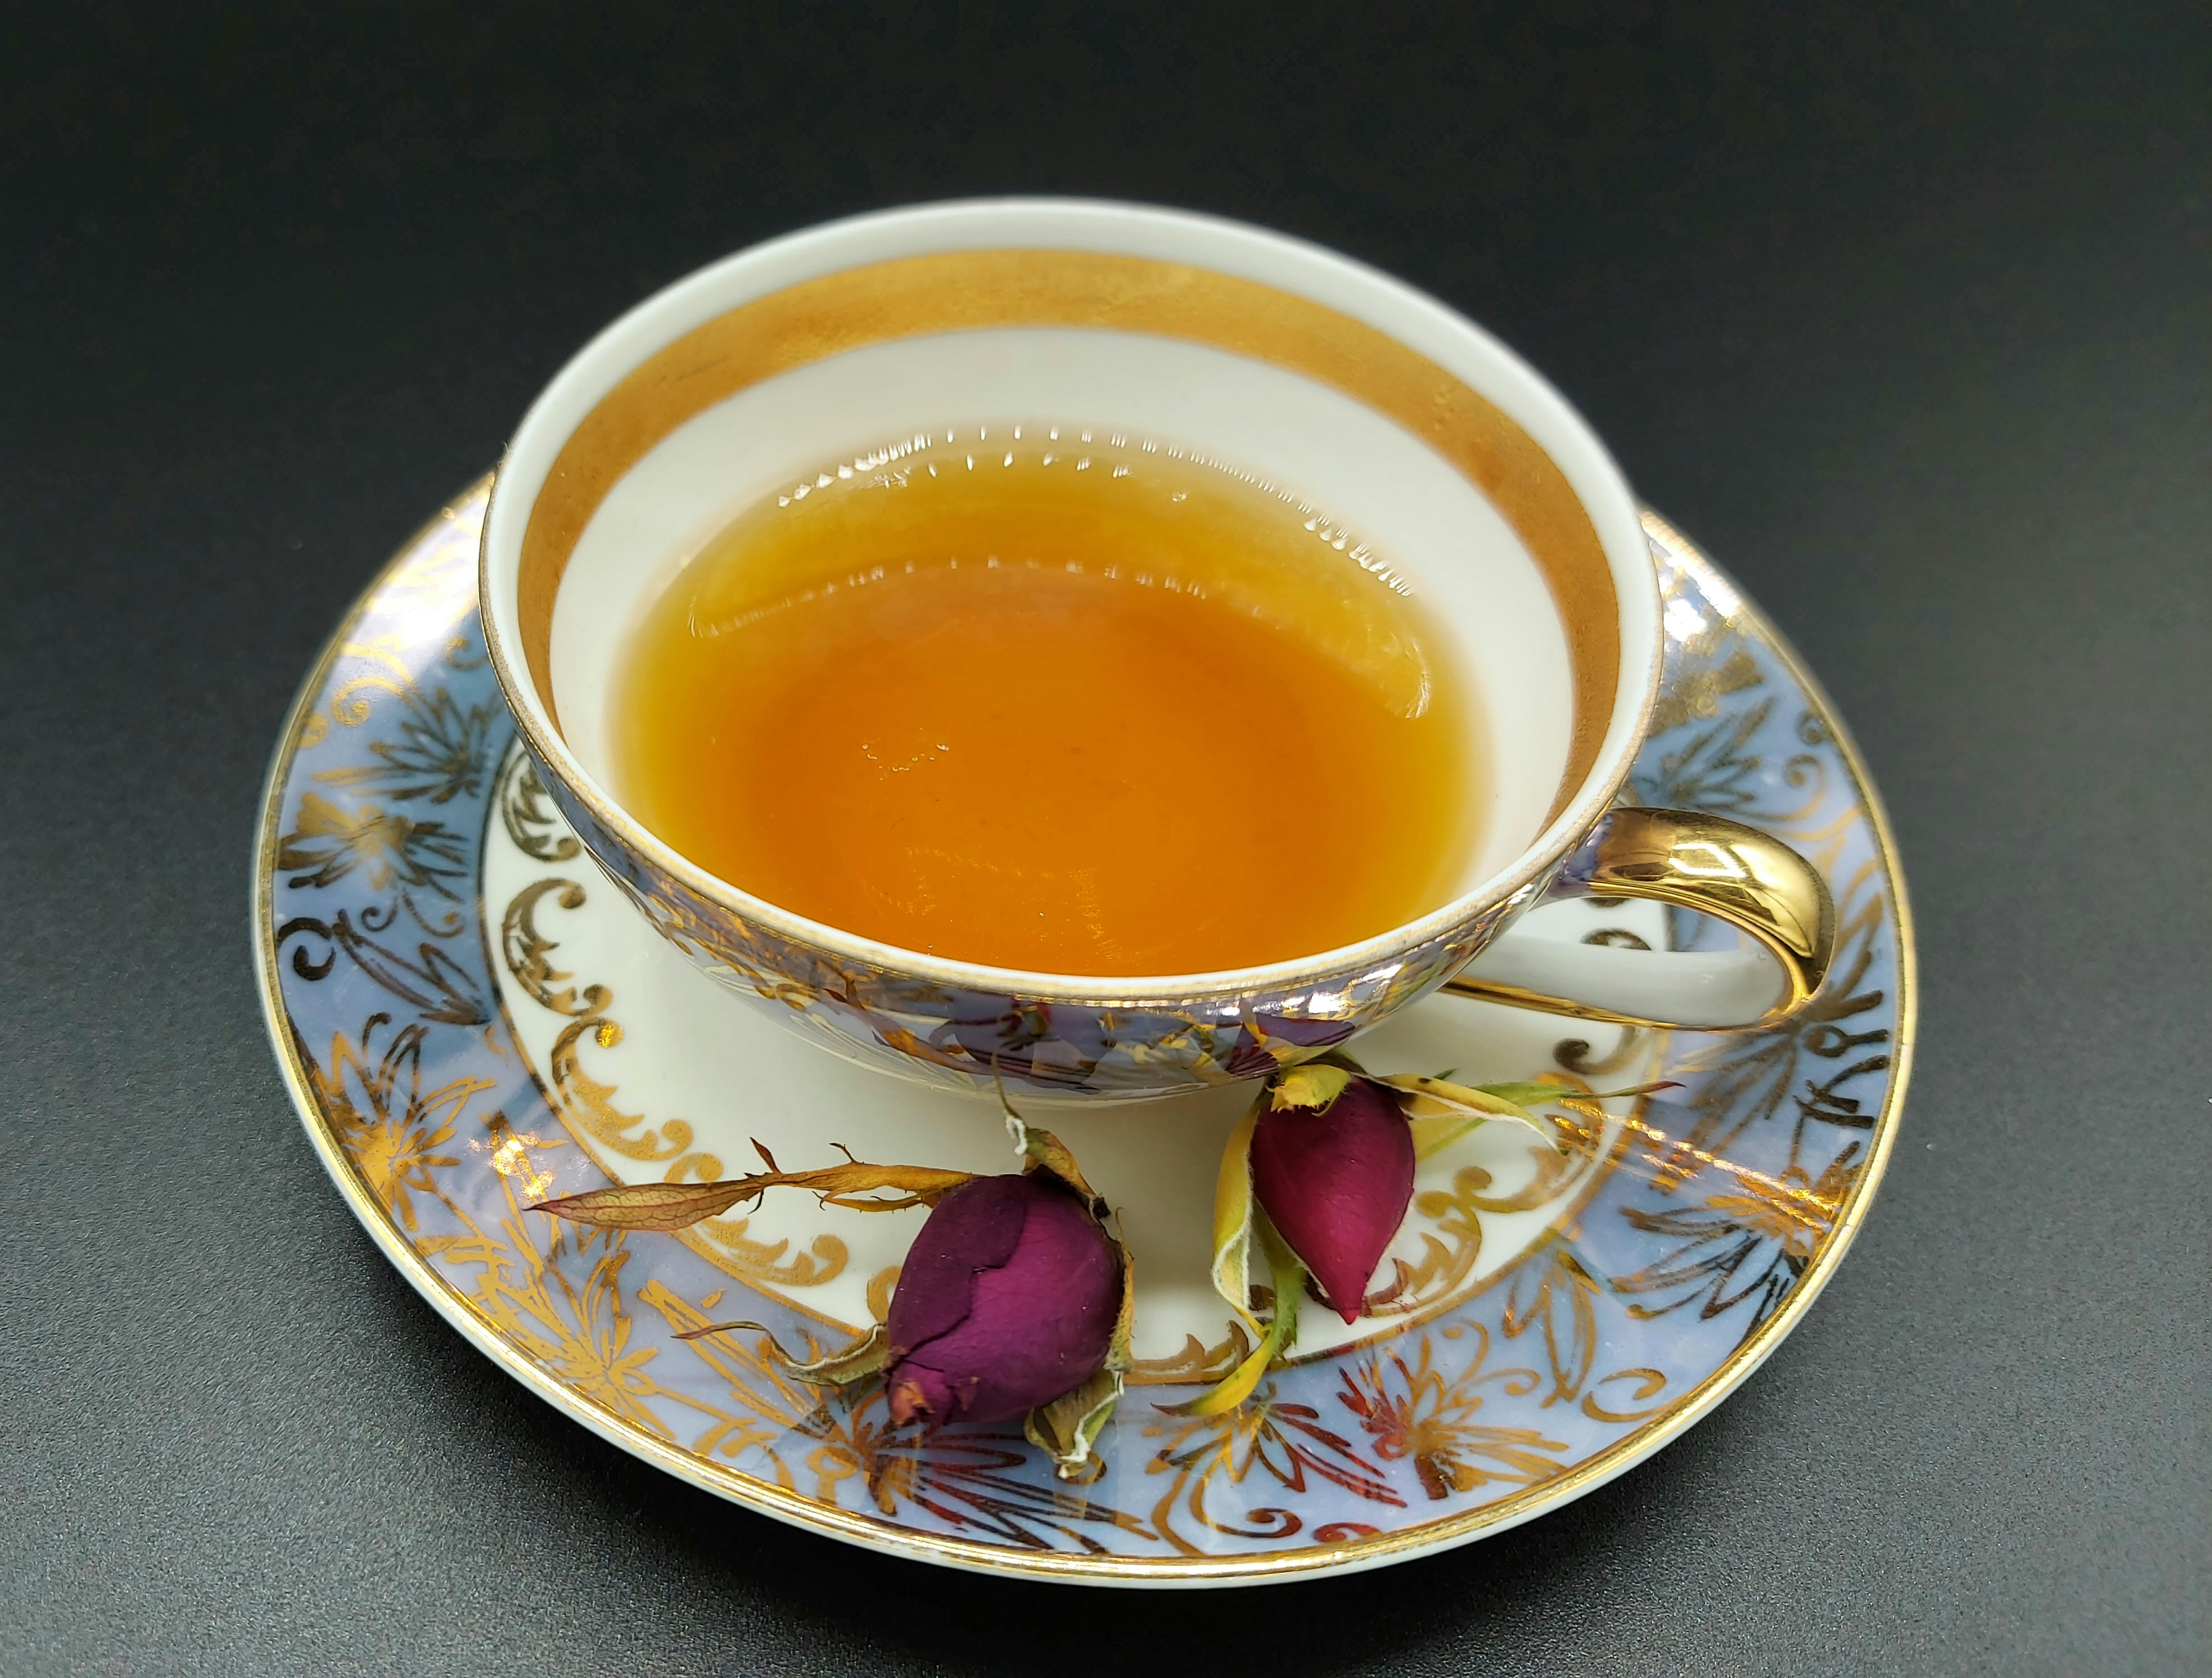 Thumbnail for Ahwe bayda – قهوة بيضاء